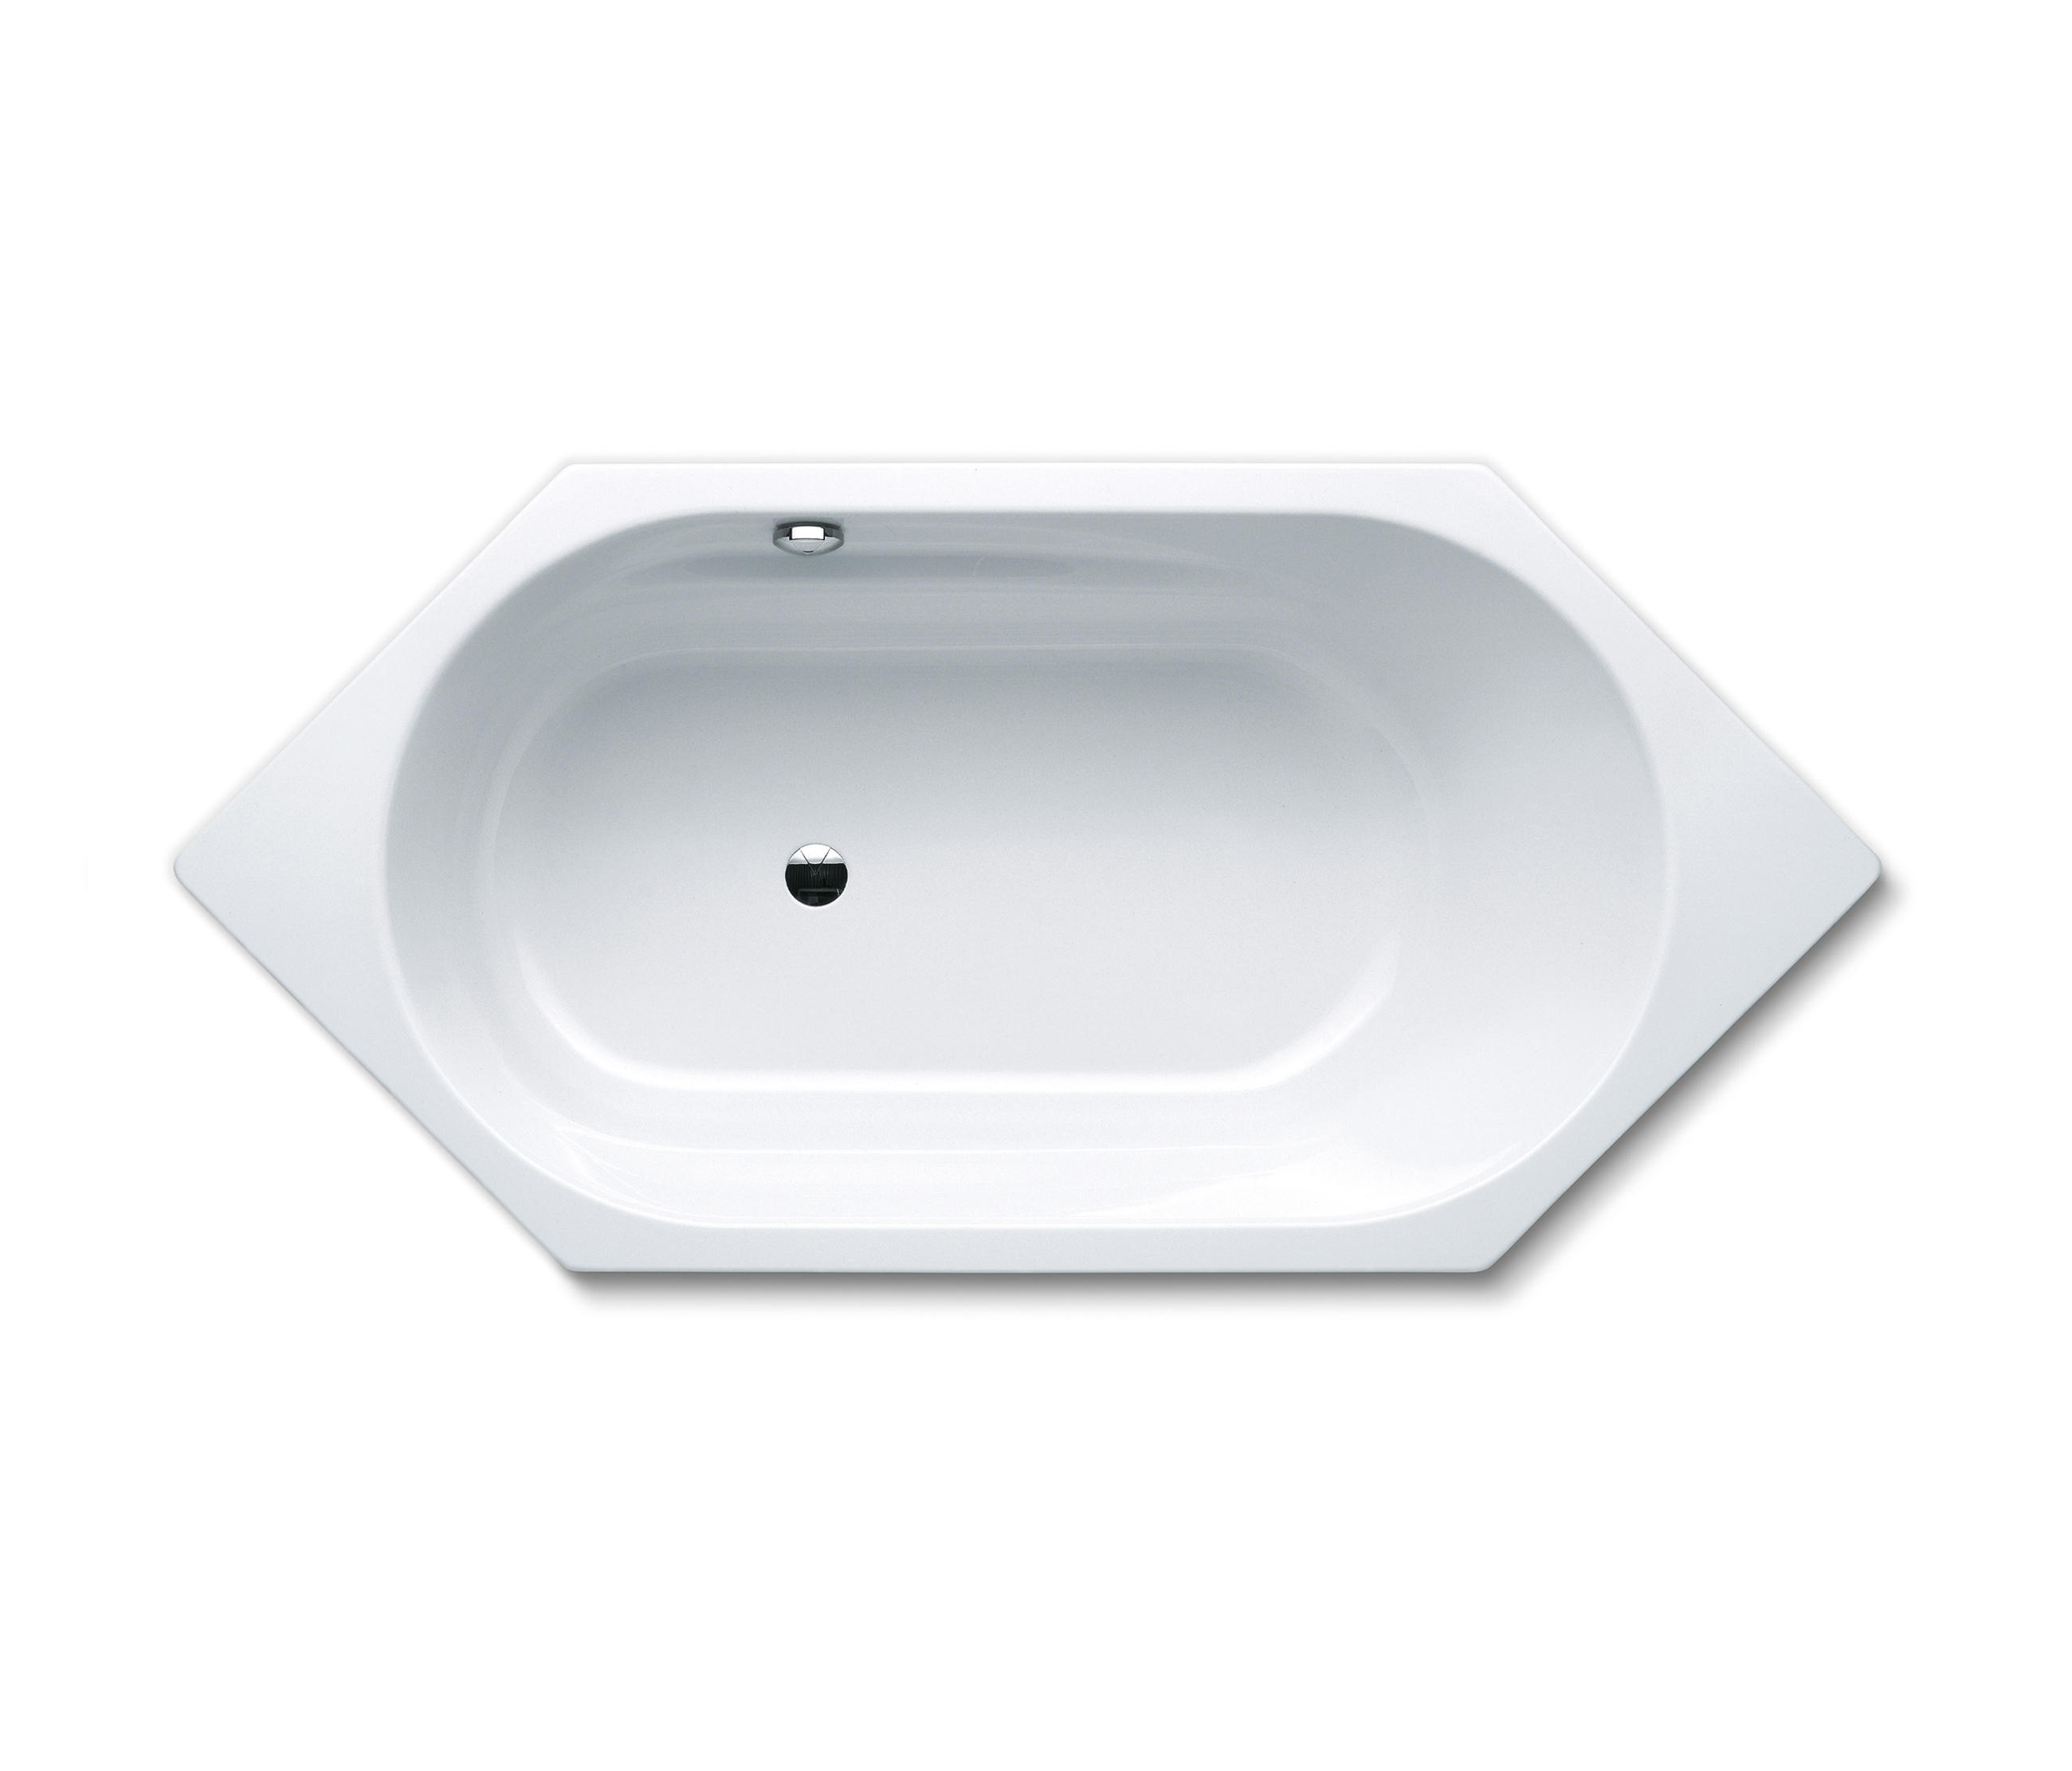 VAIO 6 - Bathtubs from Kaldewei | Architonic